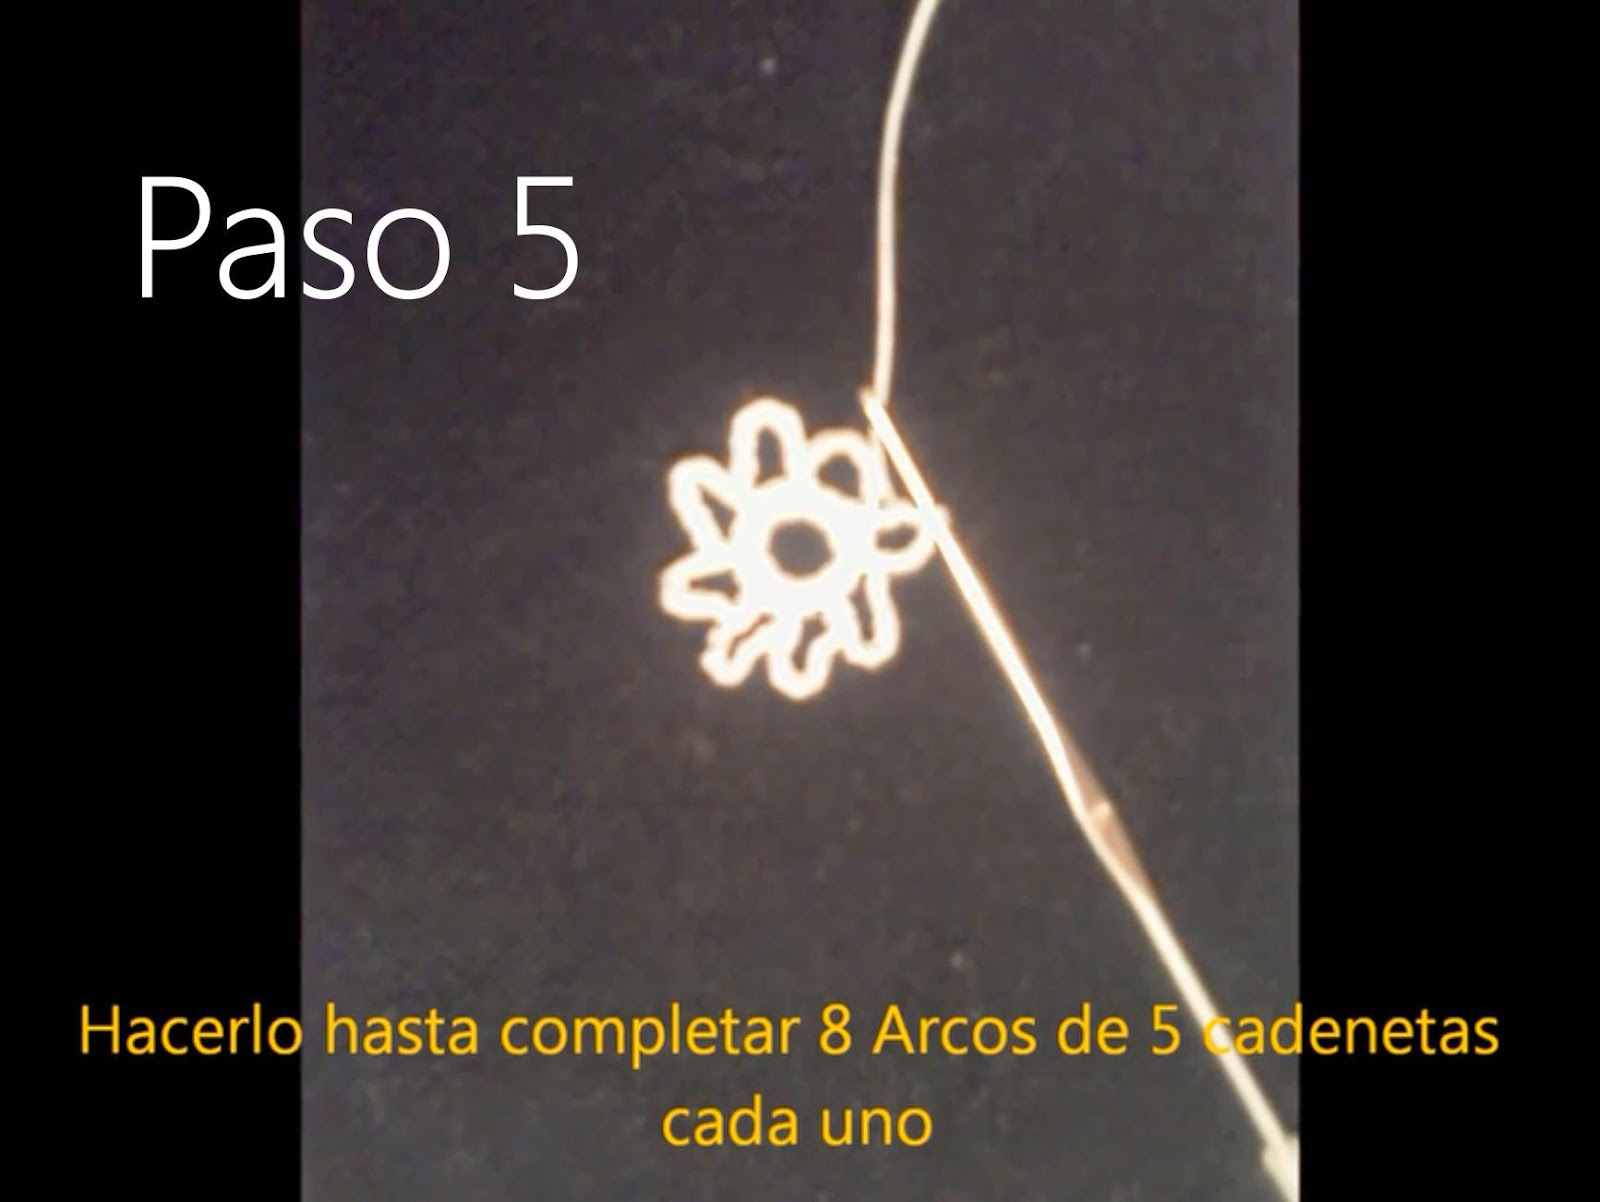 Tapete Flor Paso 5